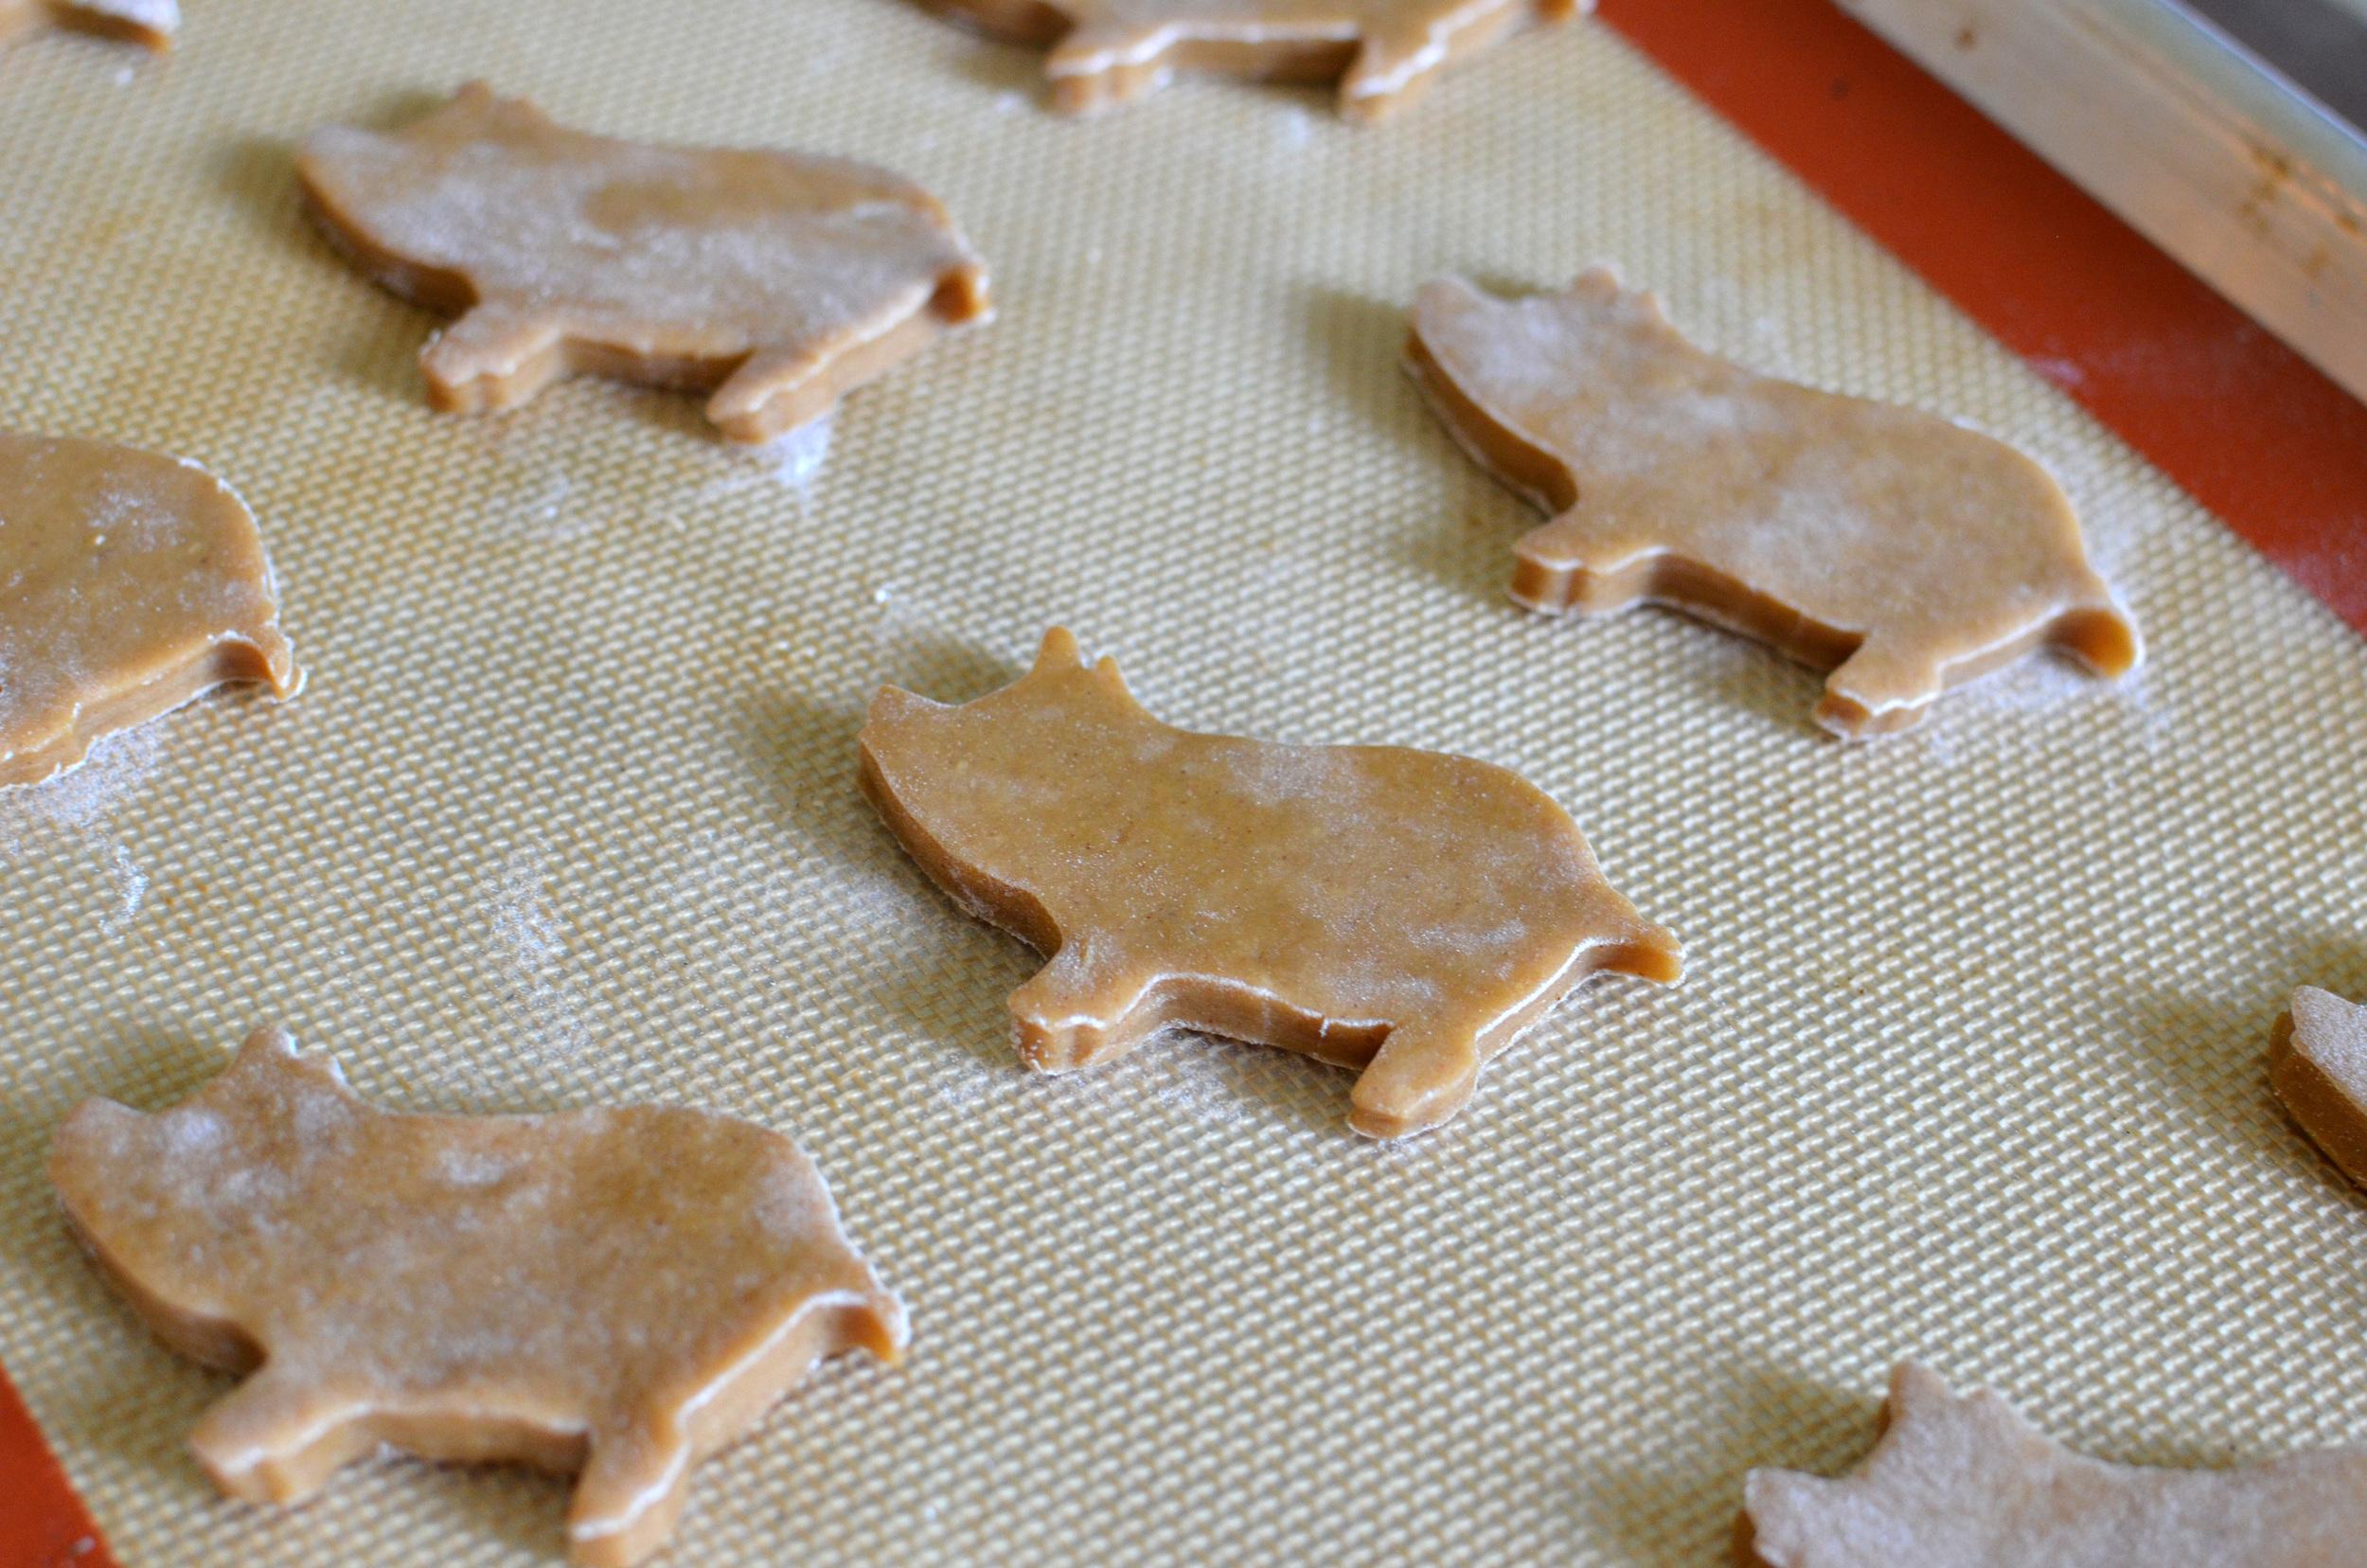 how to make cerditos, cochinitos, marranitos, or puerquitos cookies. how to photos